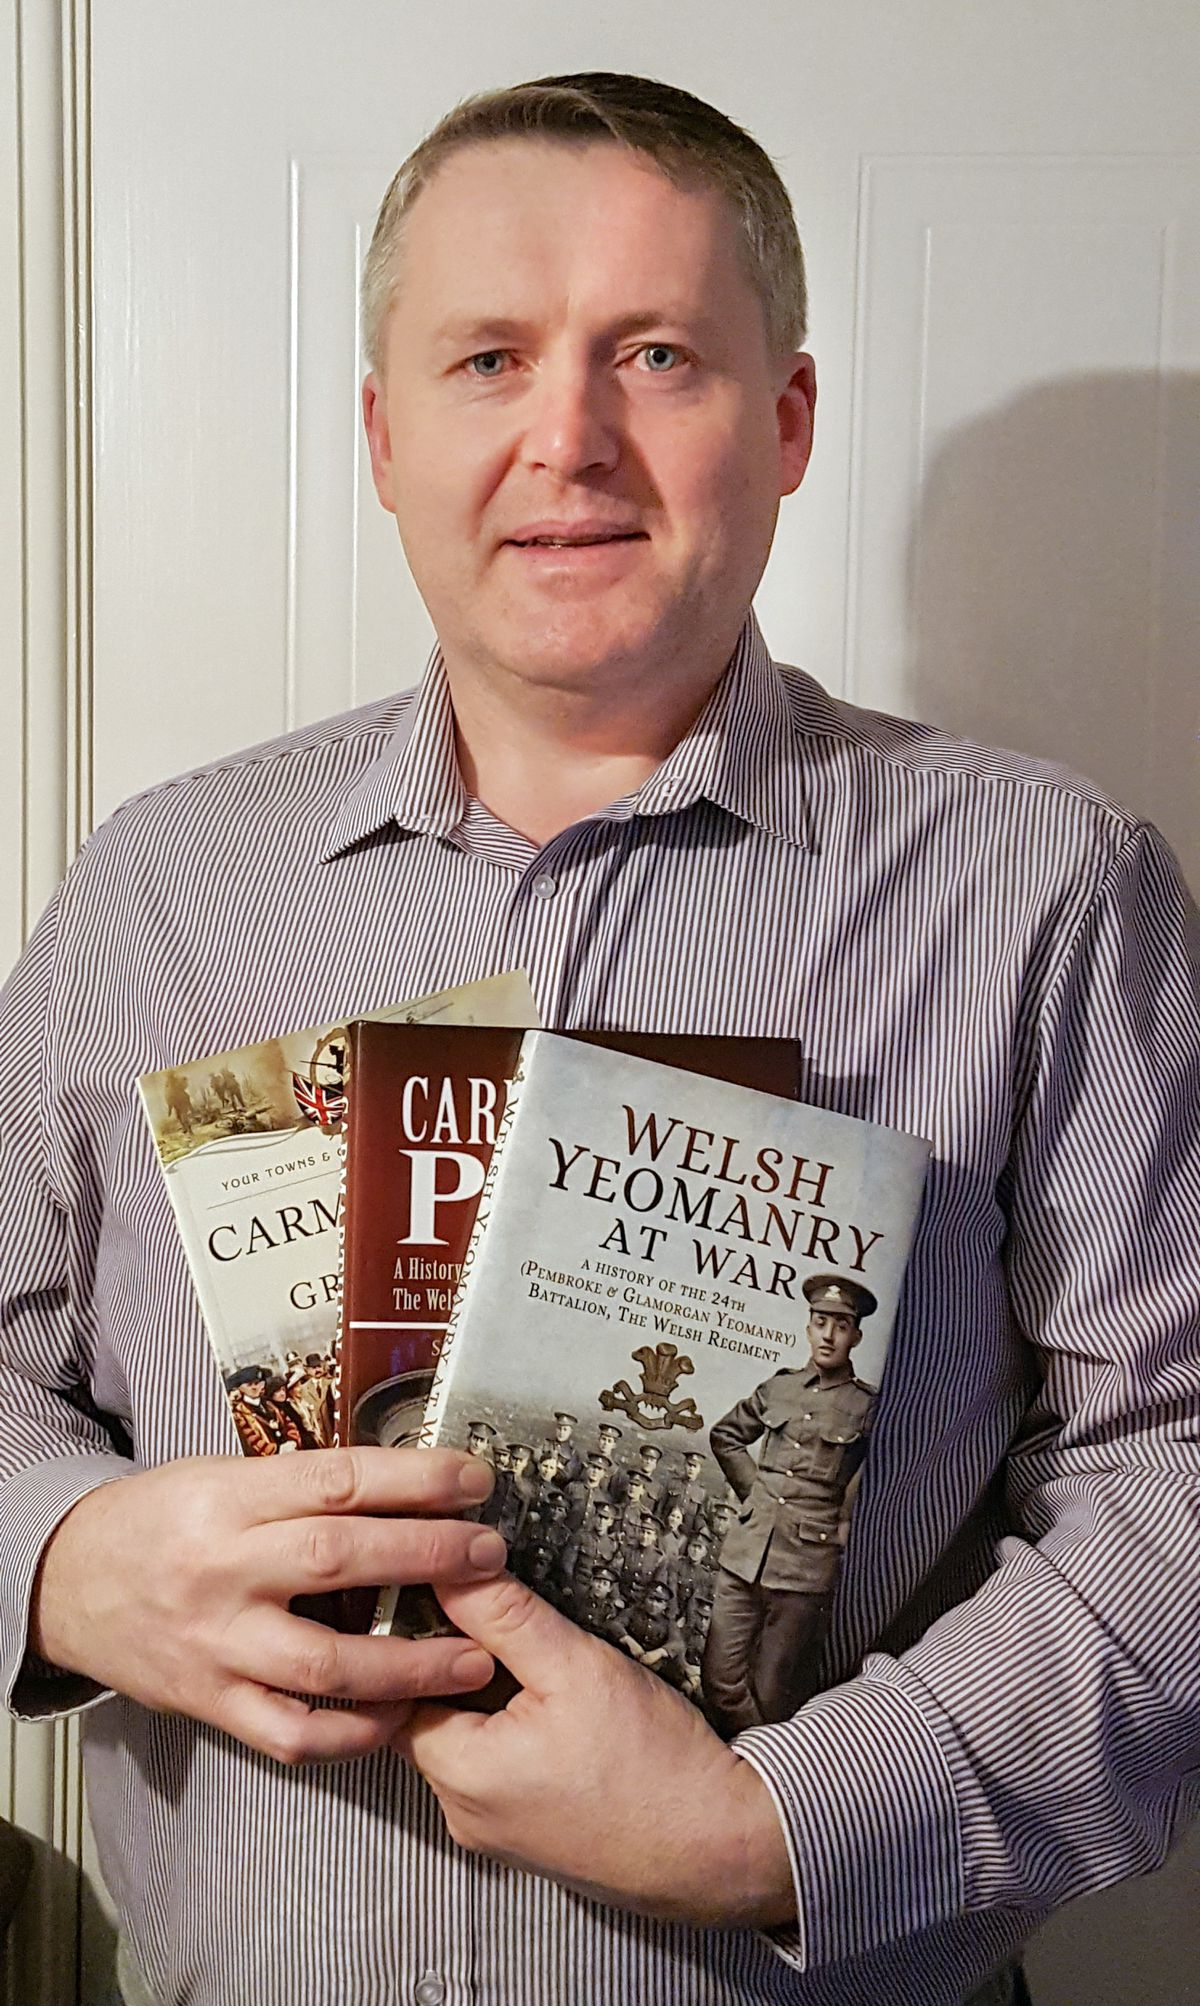 Shrewsbury's Steven John with some of his books.